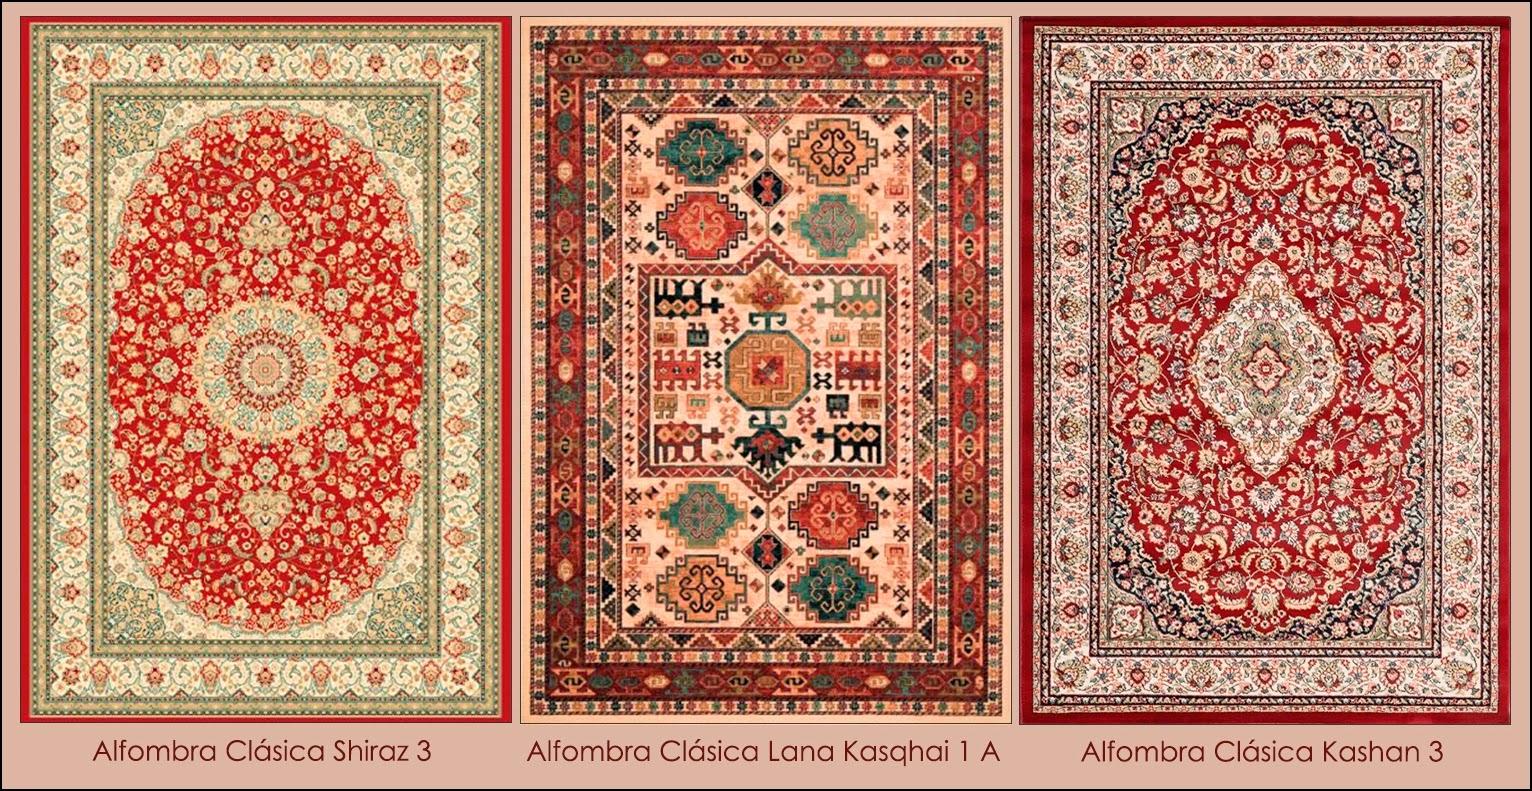 Blog de mbar muebles alfombras for Alfombras persas historia